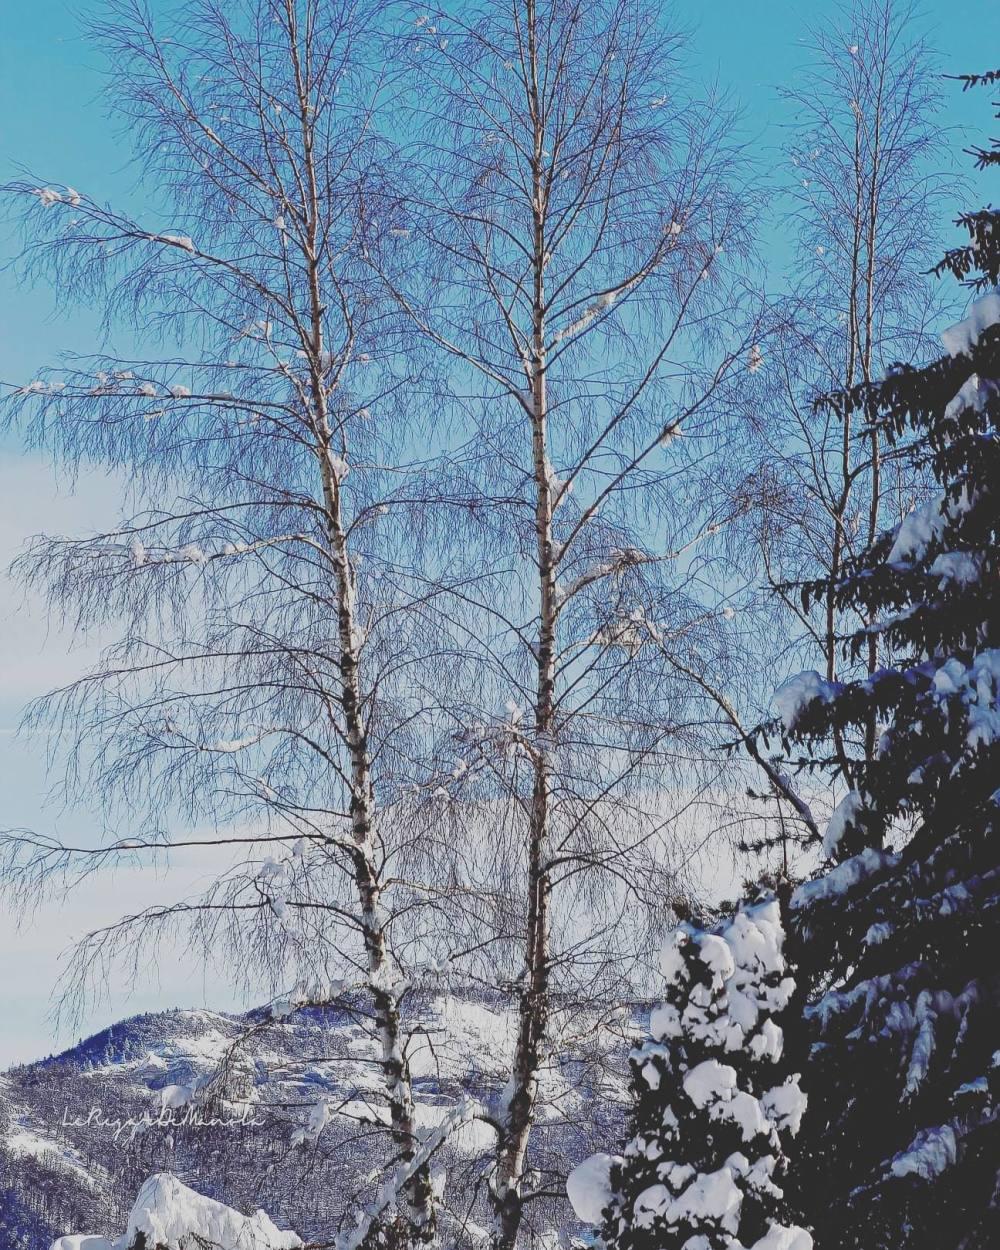 Un arbre Joyeux